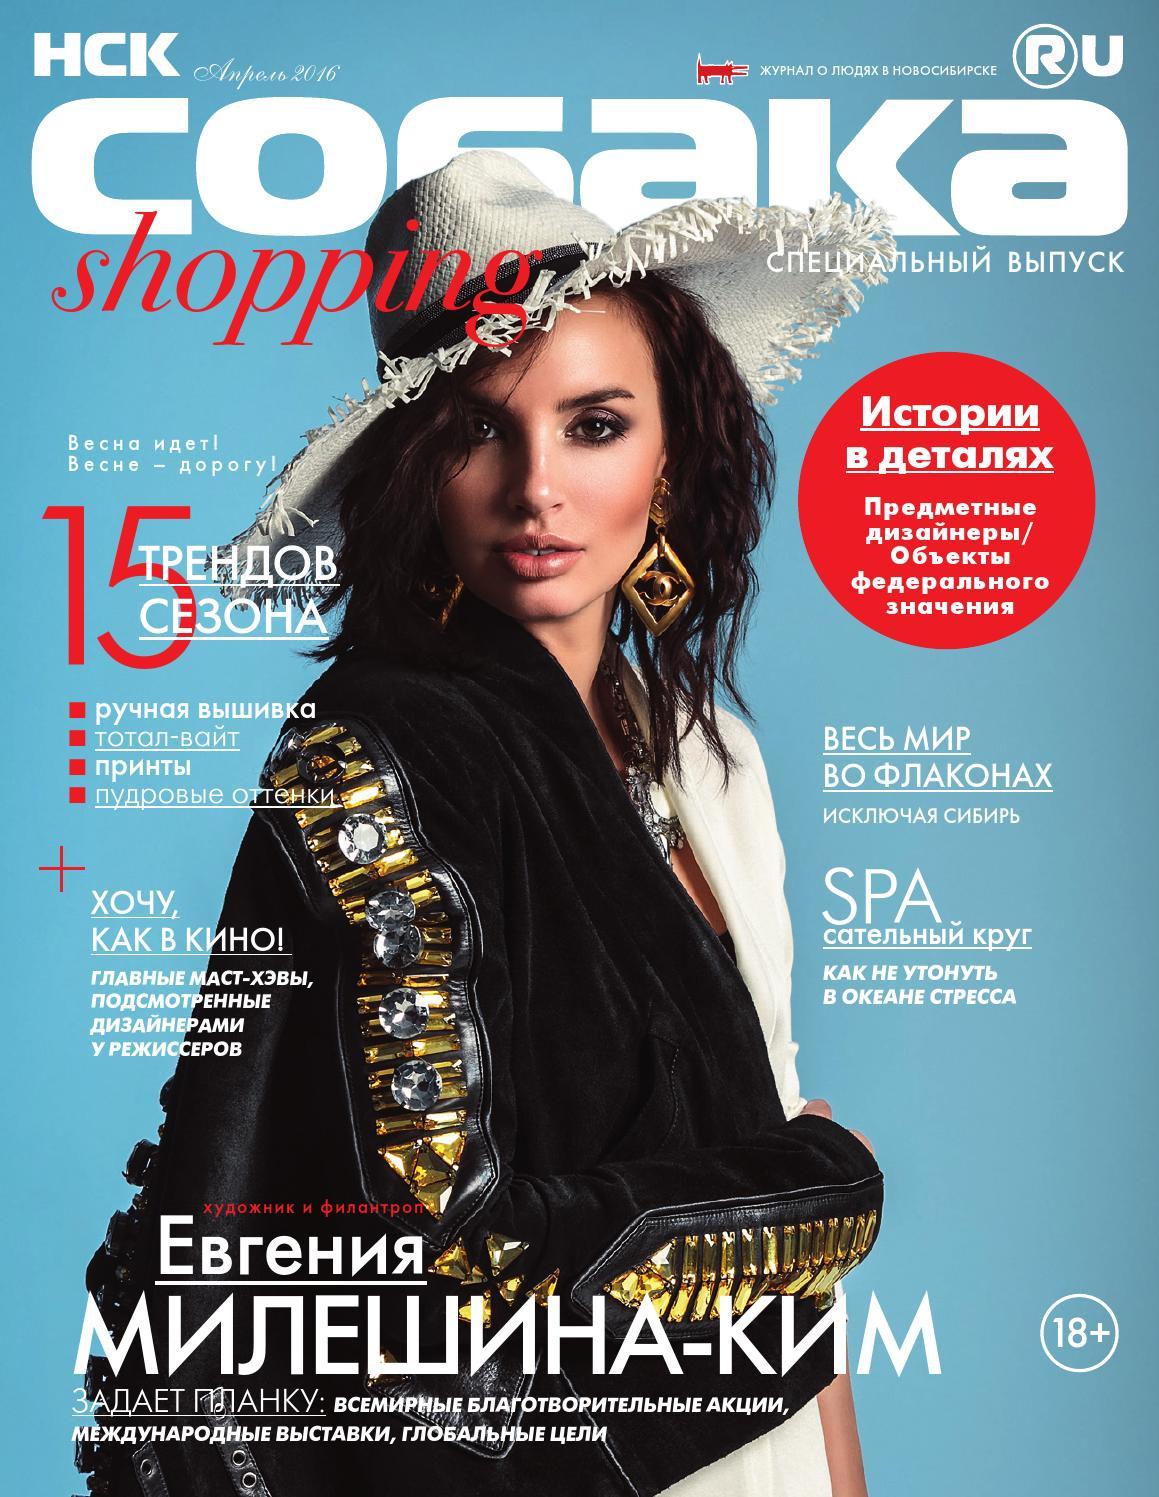 d6a91051b нск.собака.ru shopping #03 by TOPMEDIA-NSK - issuu